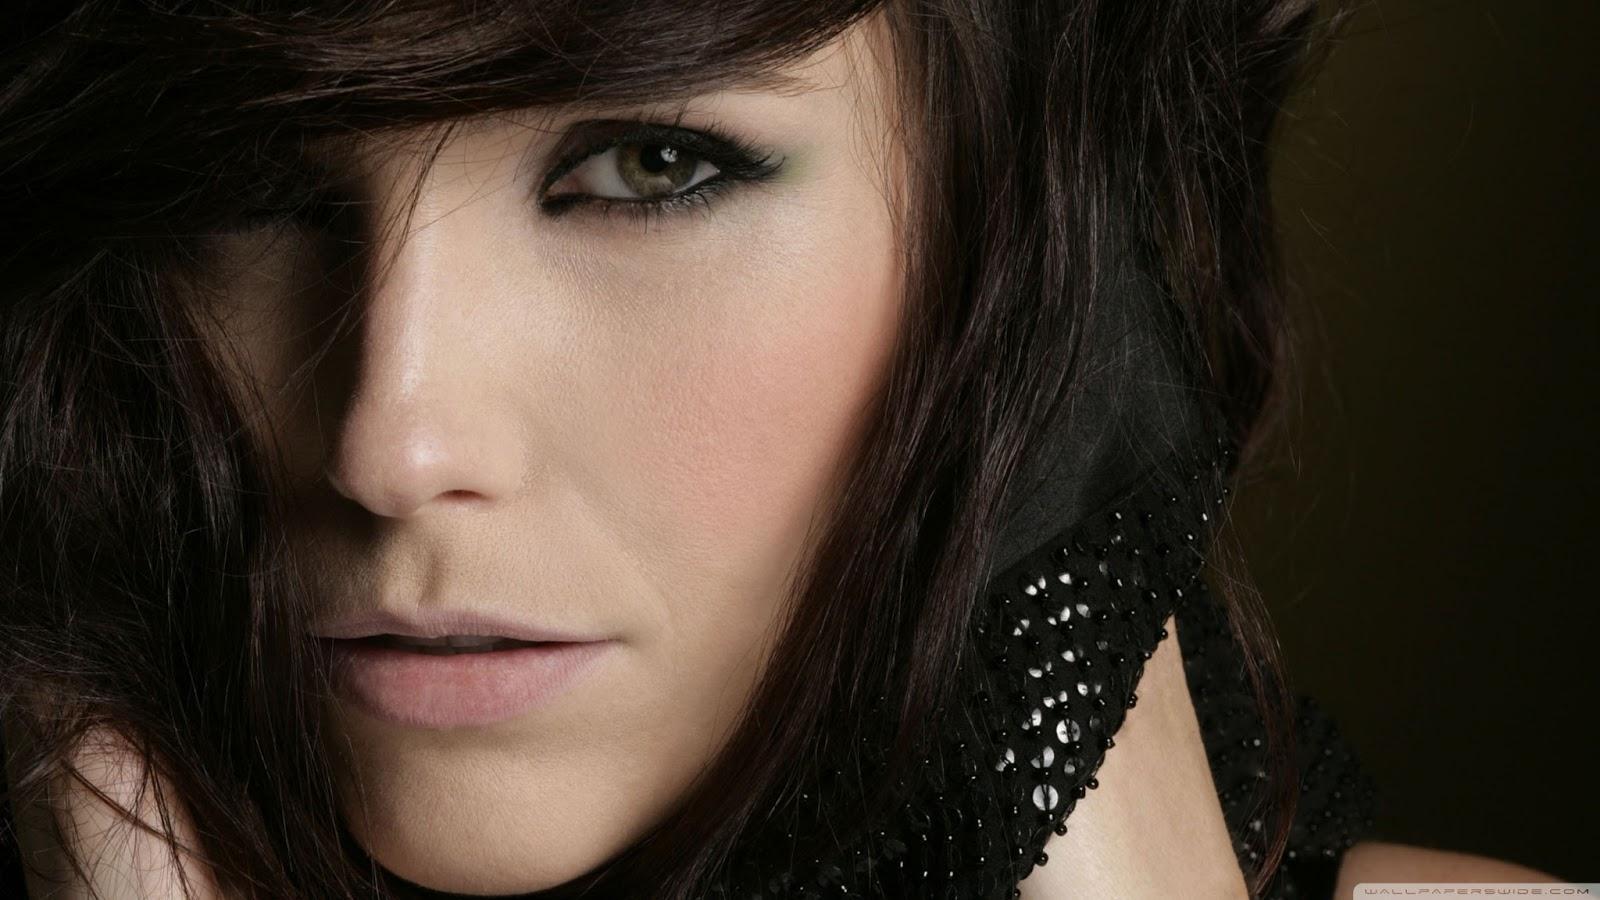 beautiful female celebrities wallpapers - photo #44